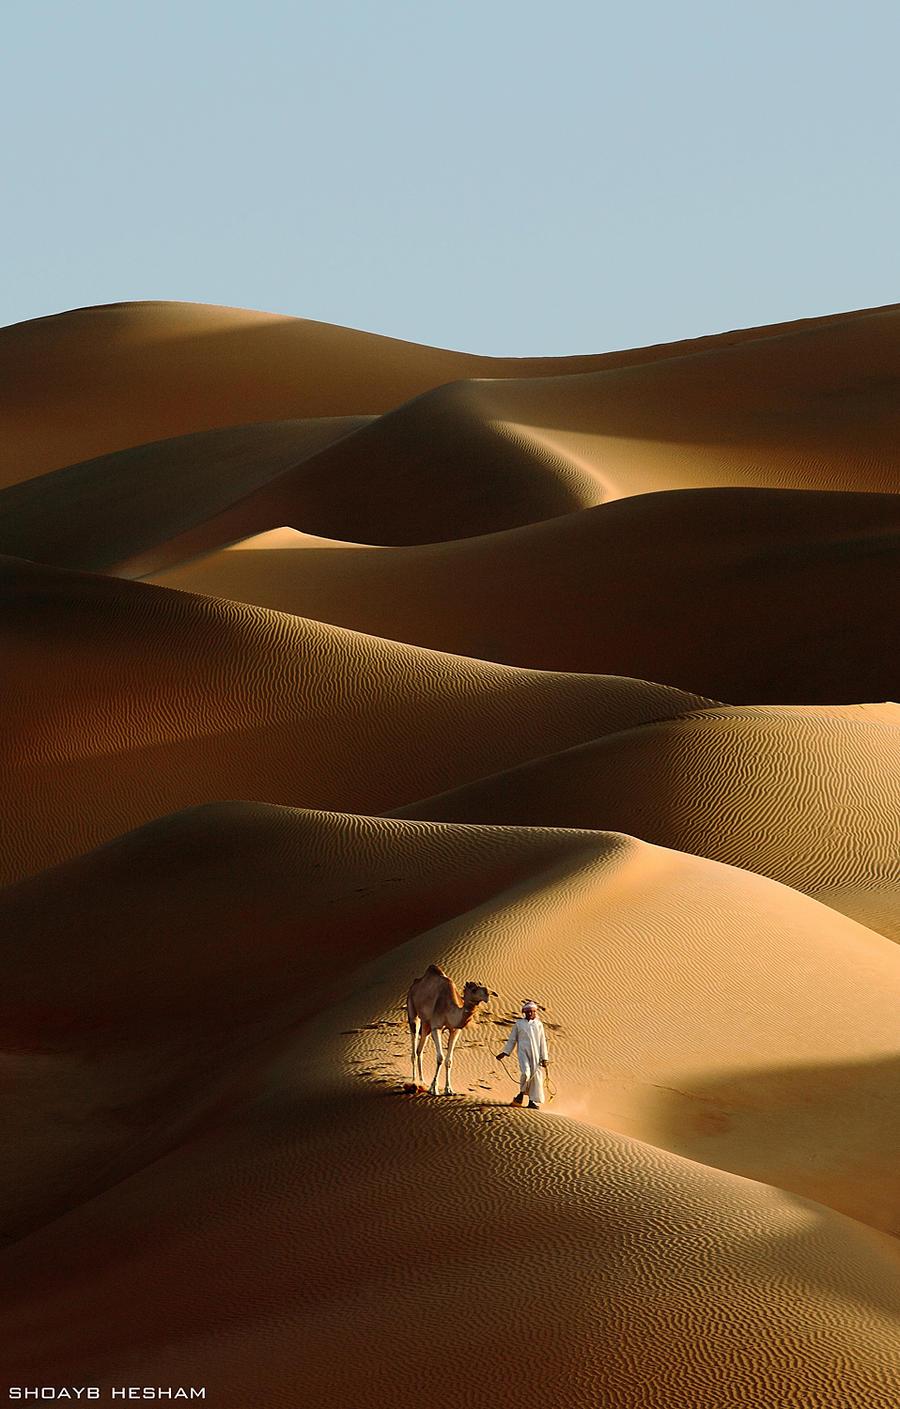 Desert Walk by Shoayb